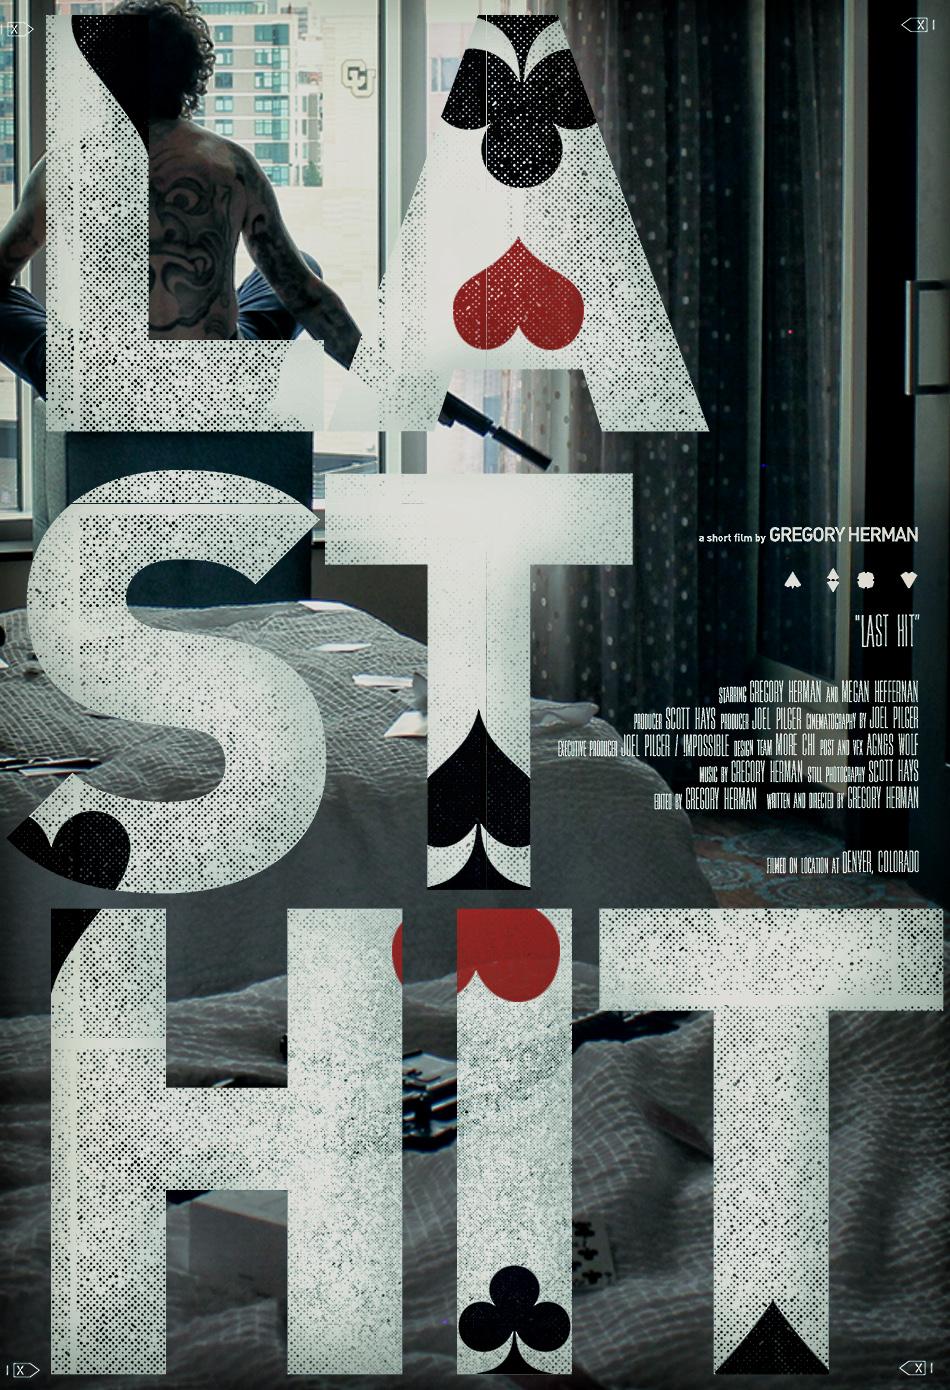 LAST_HIT_Poster_12.jpg